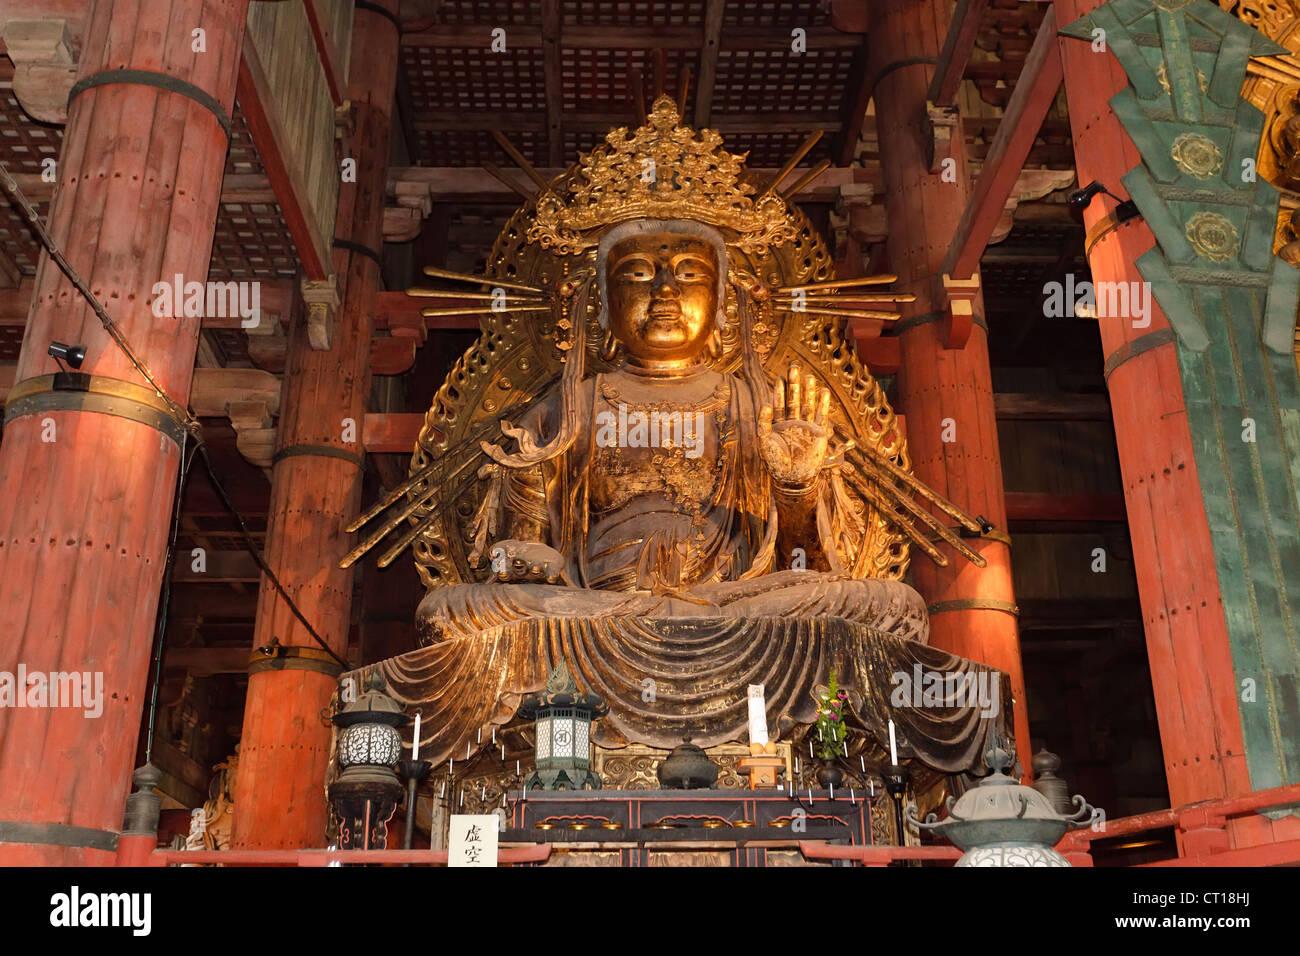 amida buddha giant metal statue in Todaiji temple, Nara, Japan Stock Photo